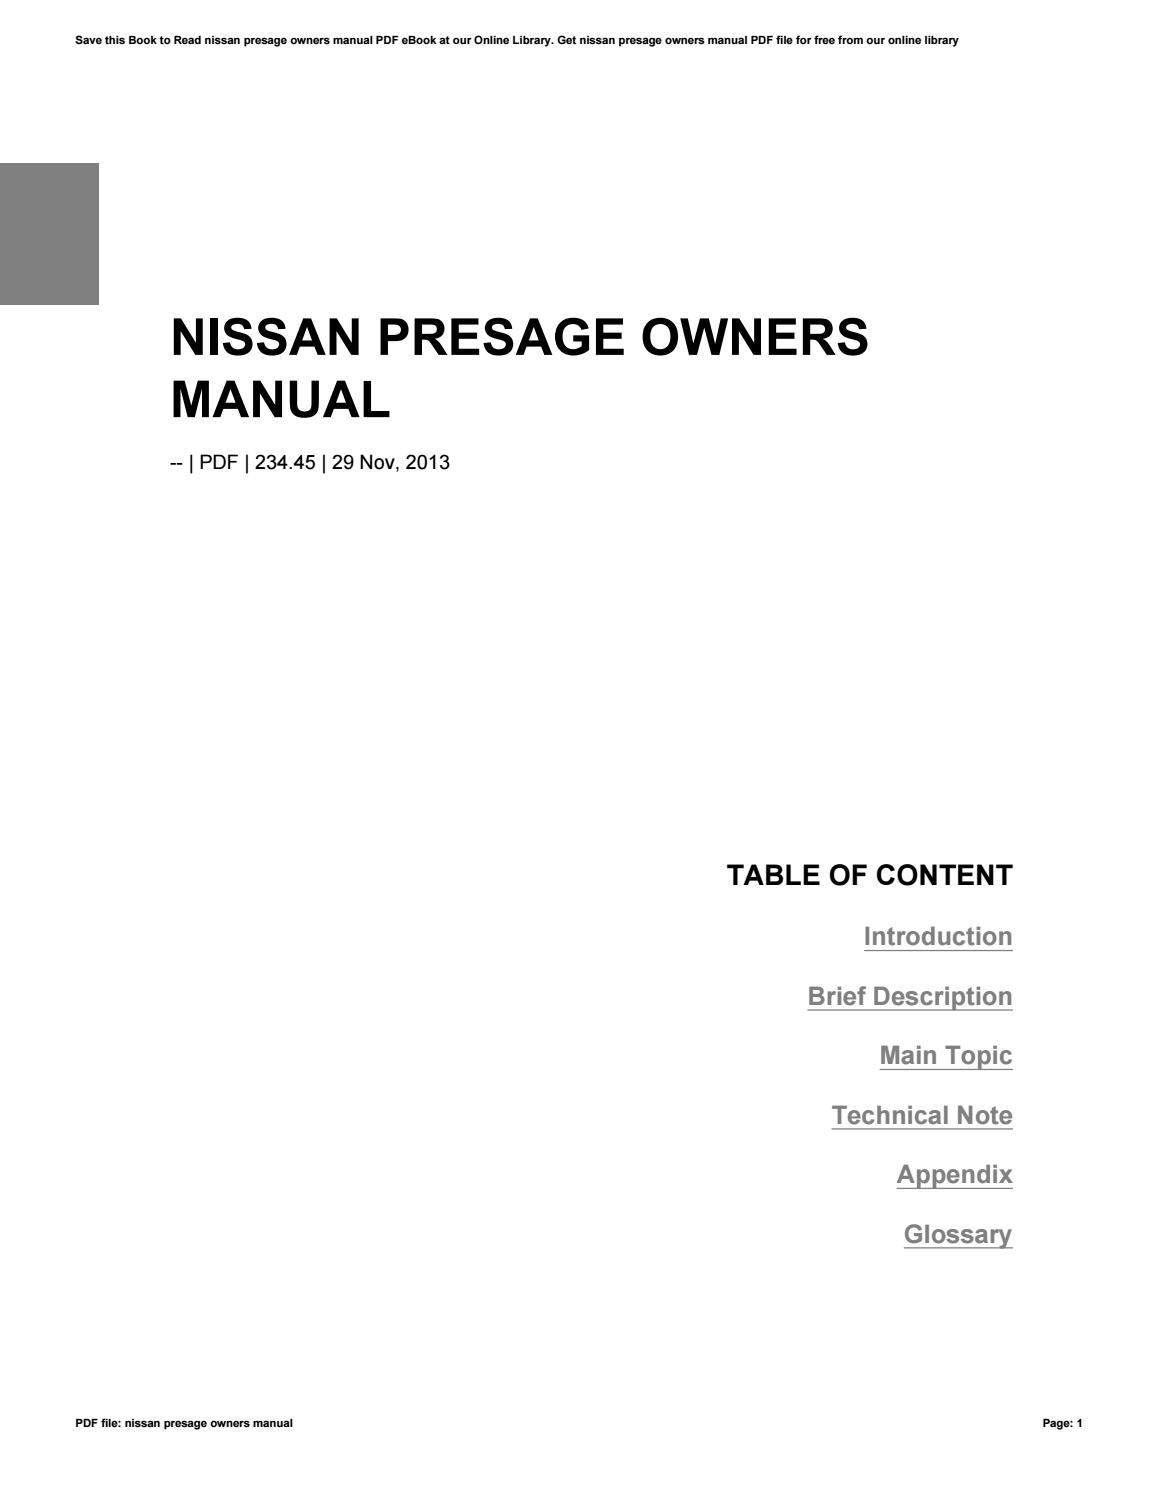 nissan presage user manual ebook